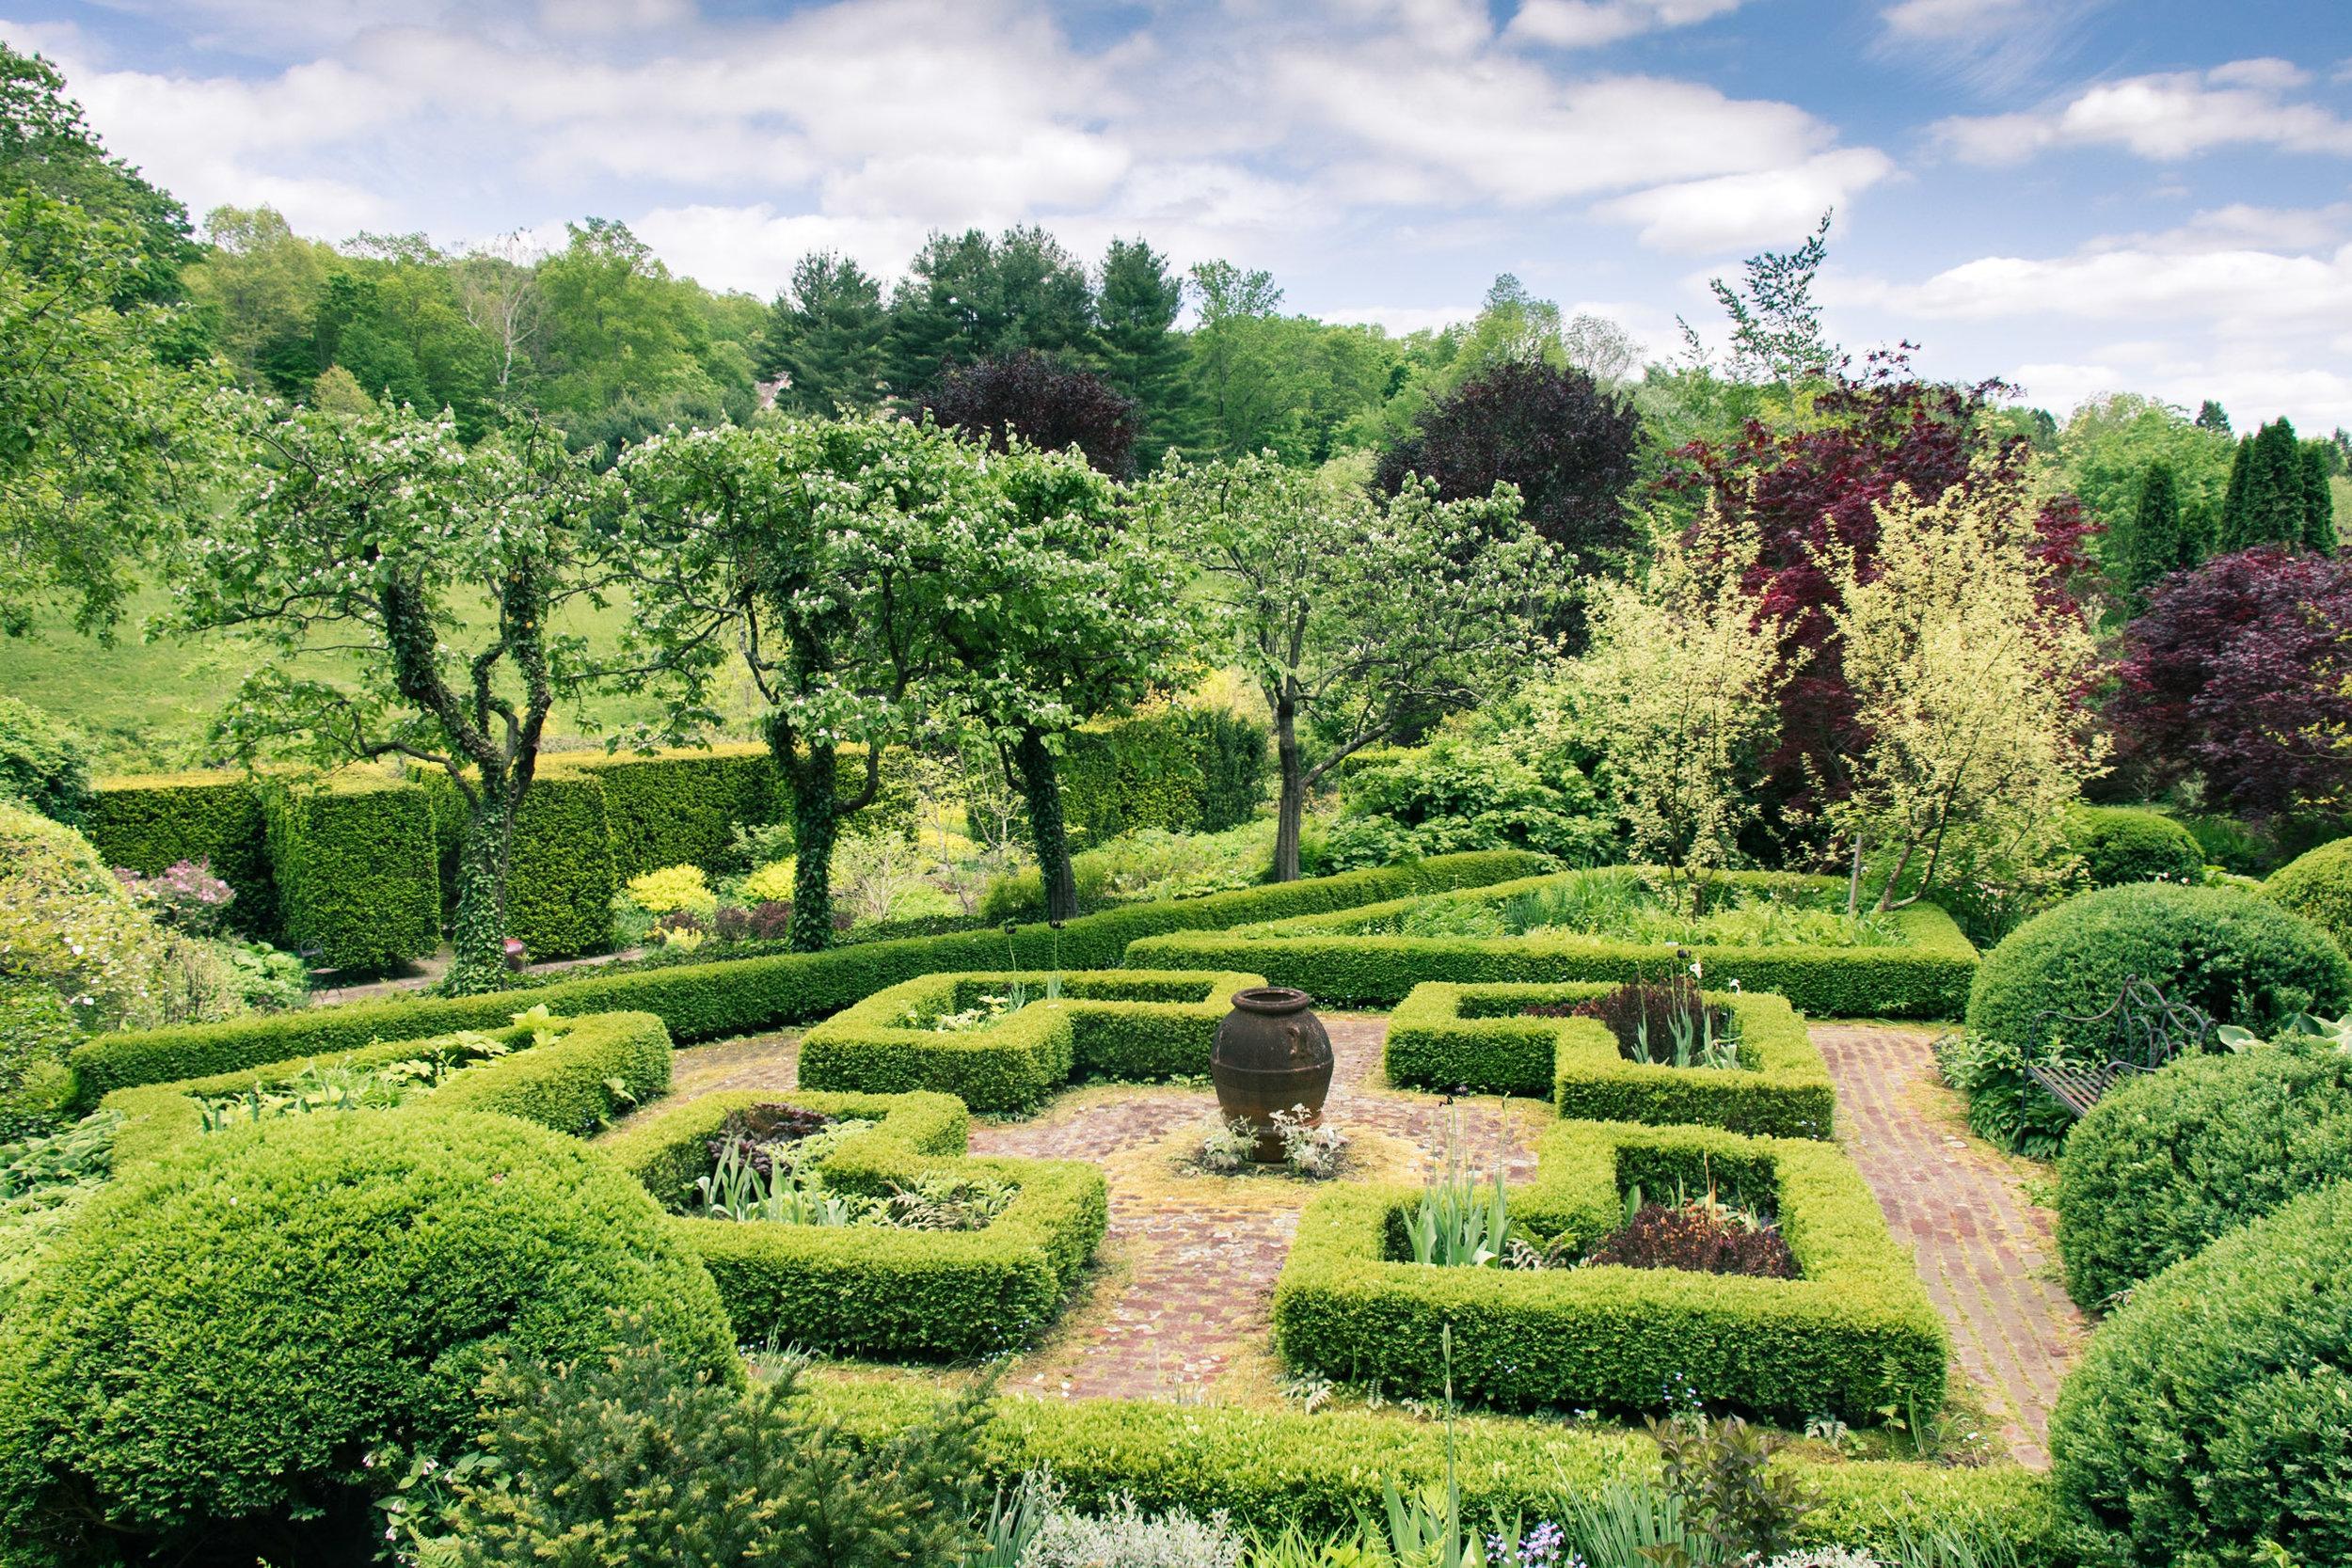 Gray Garden speaks elegantly to tradition, freedom, and flexibility.